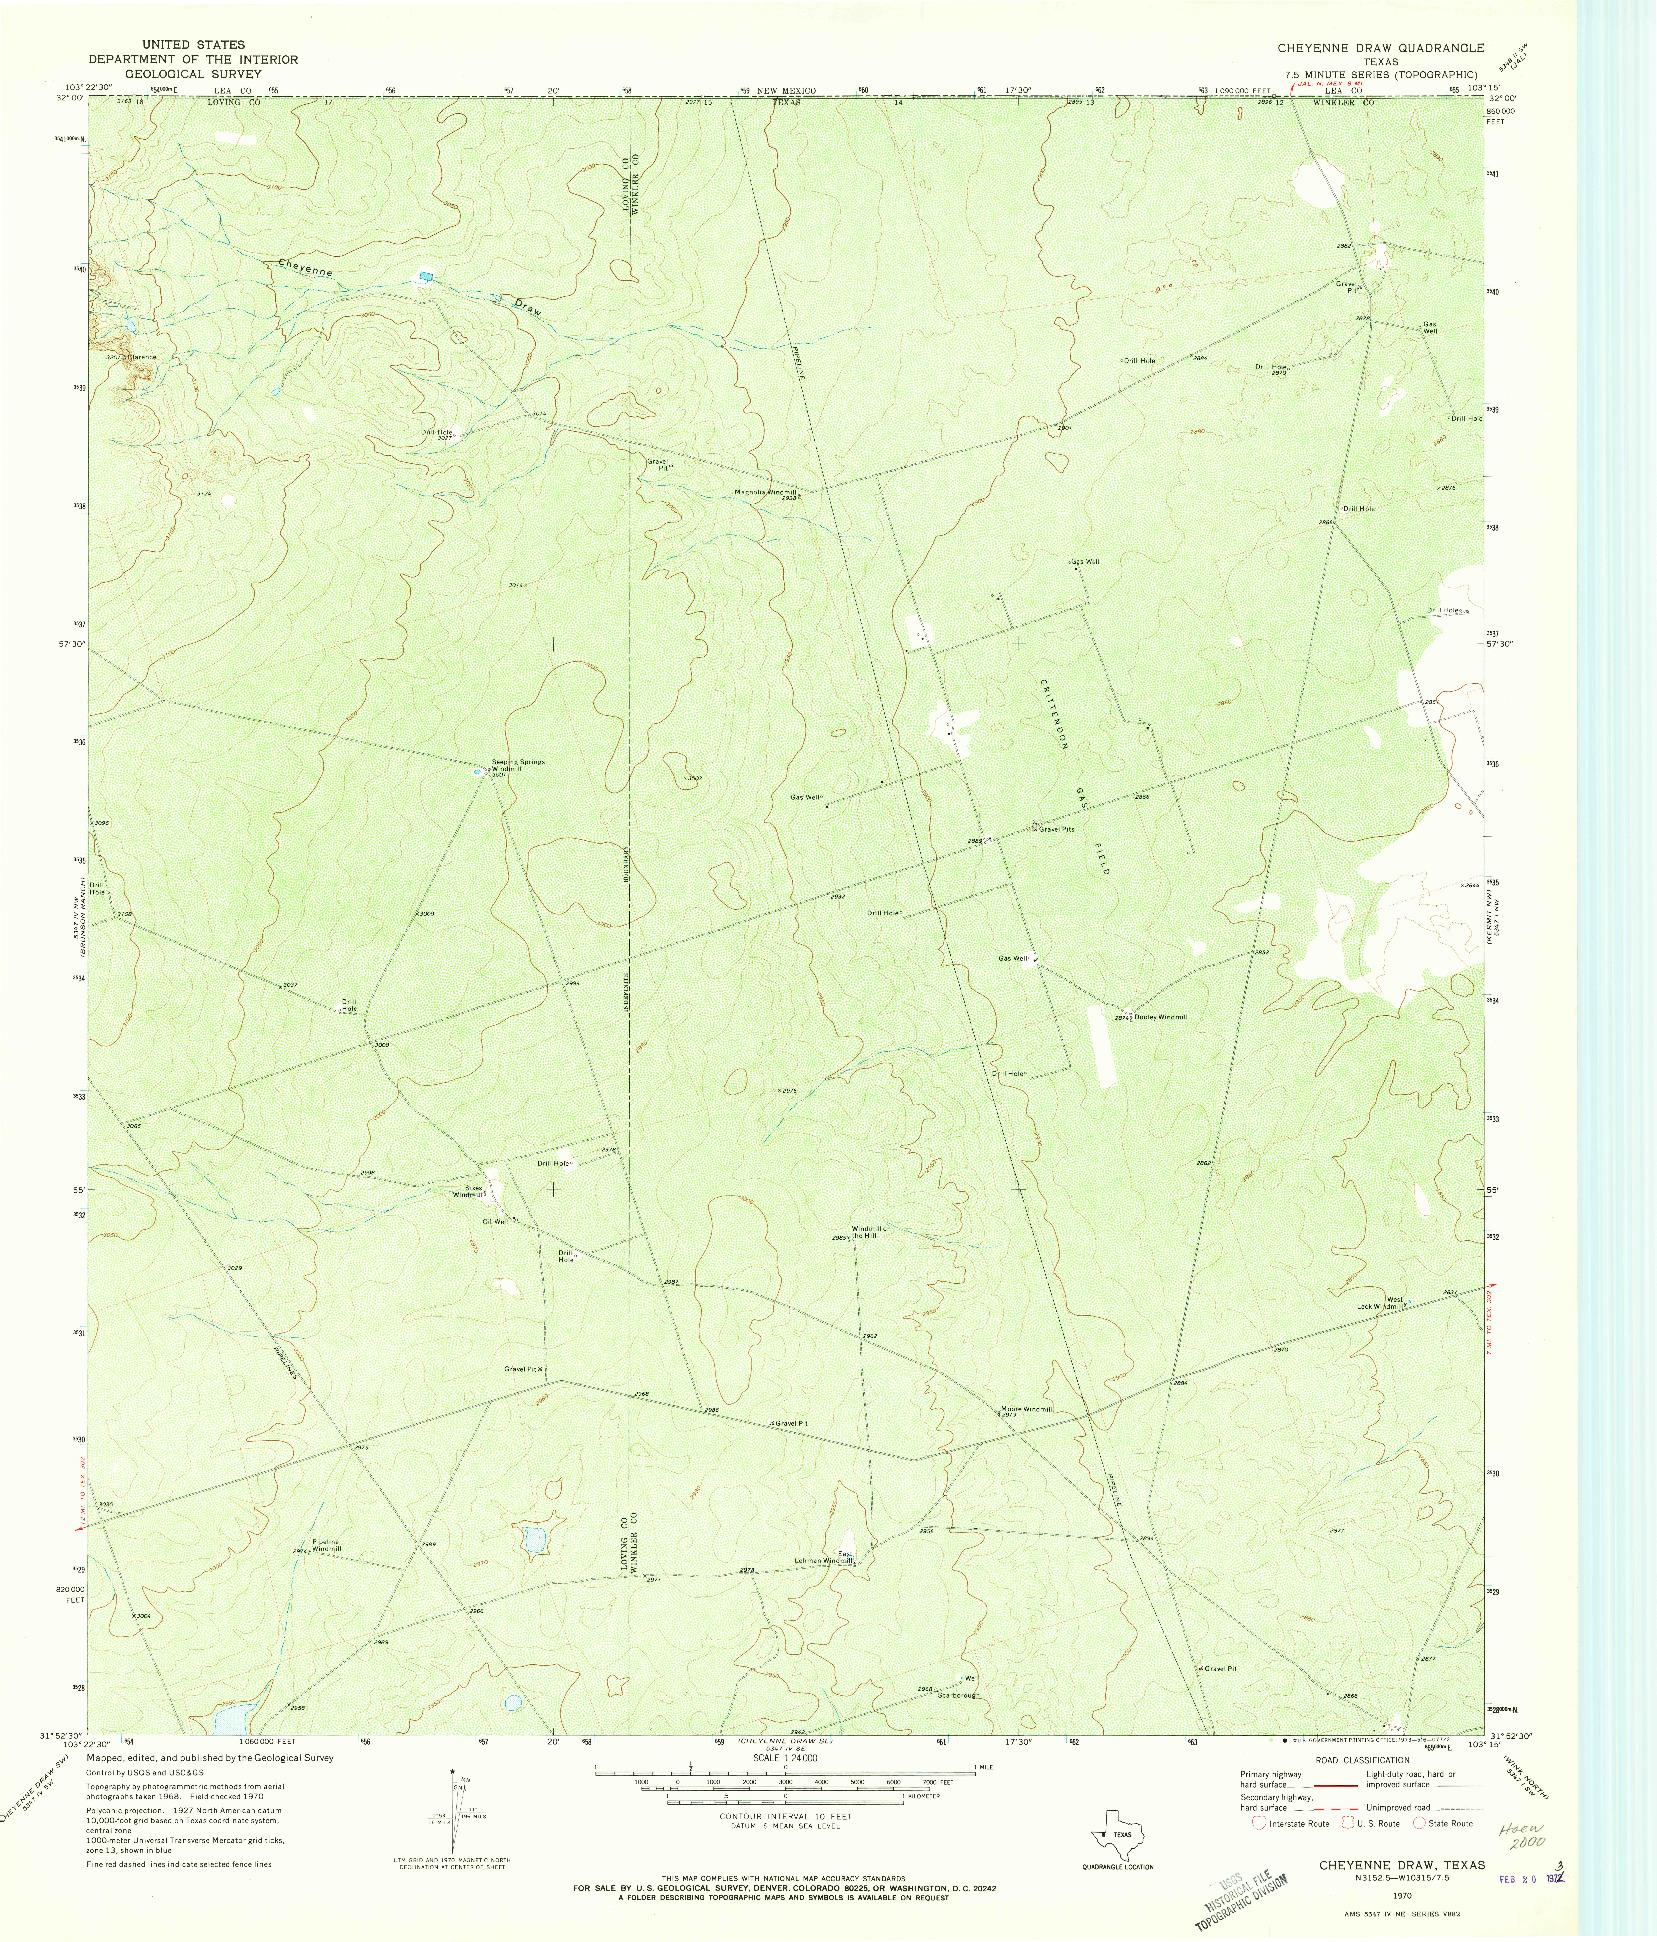 USGS 1:24000-SCALE QUADRANGLE FOR CHEYENNE DRAW, TX 1970